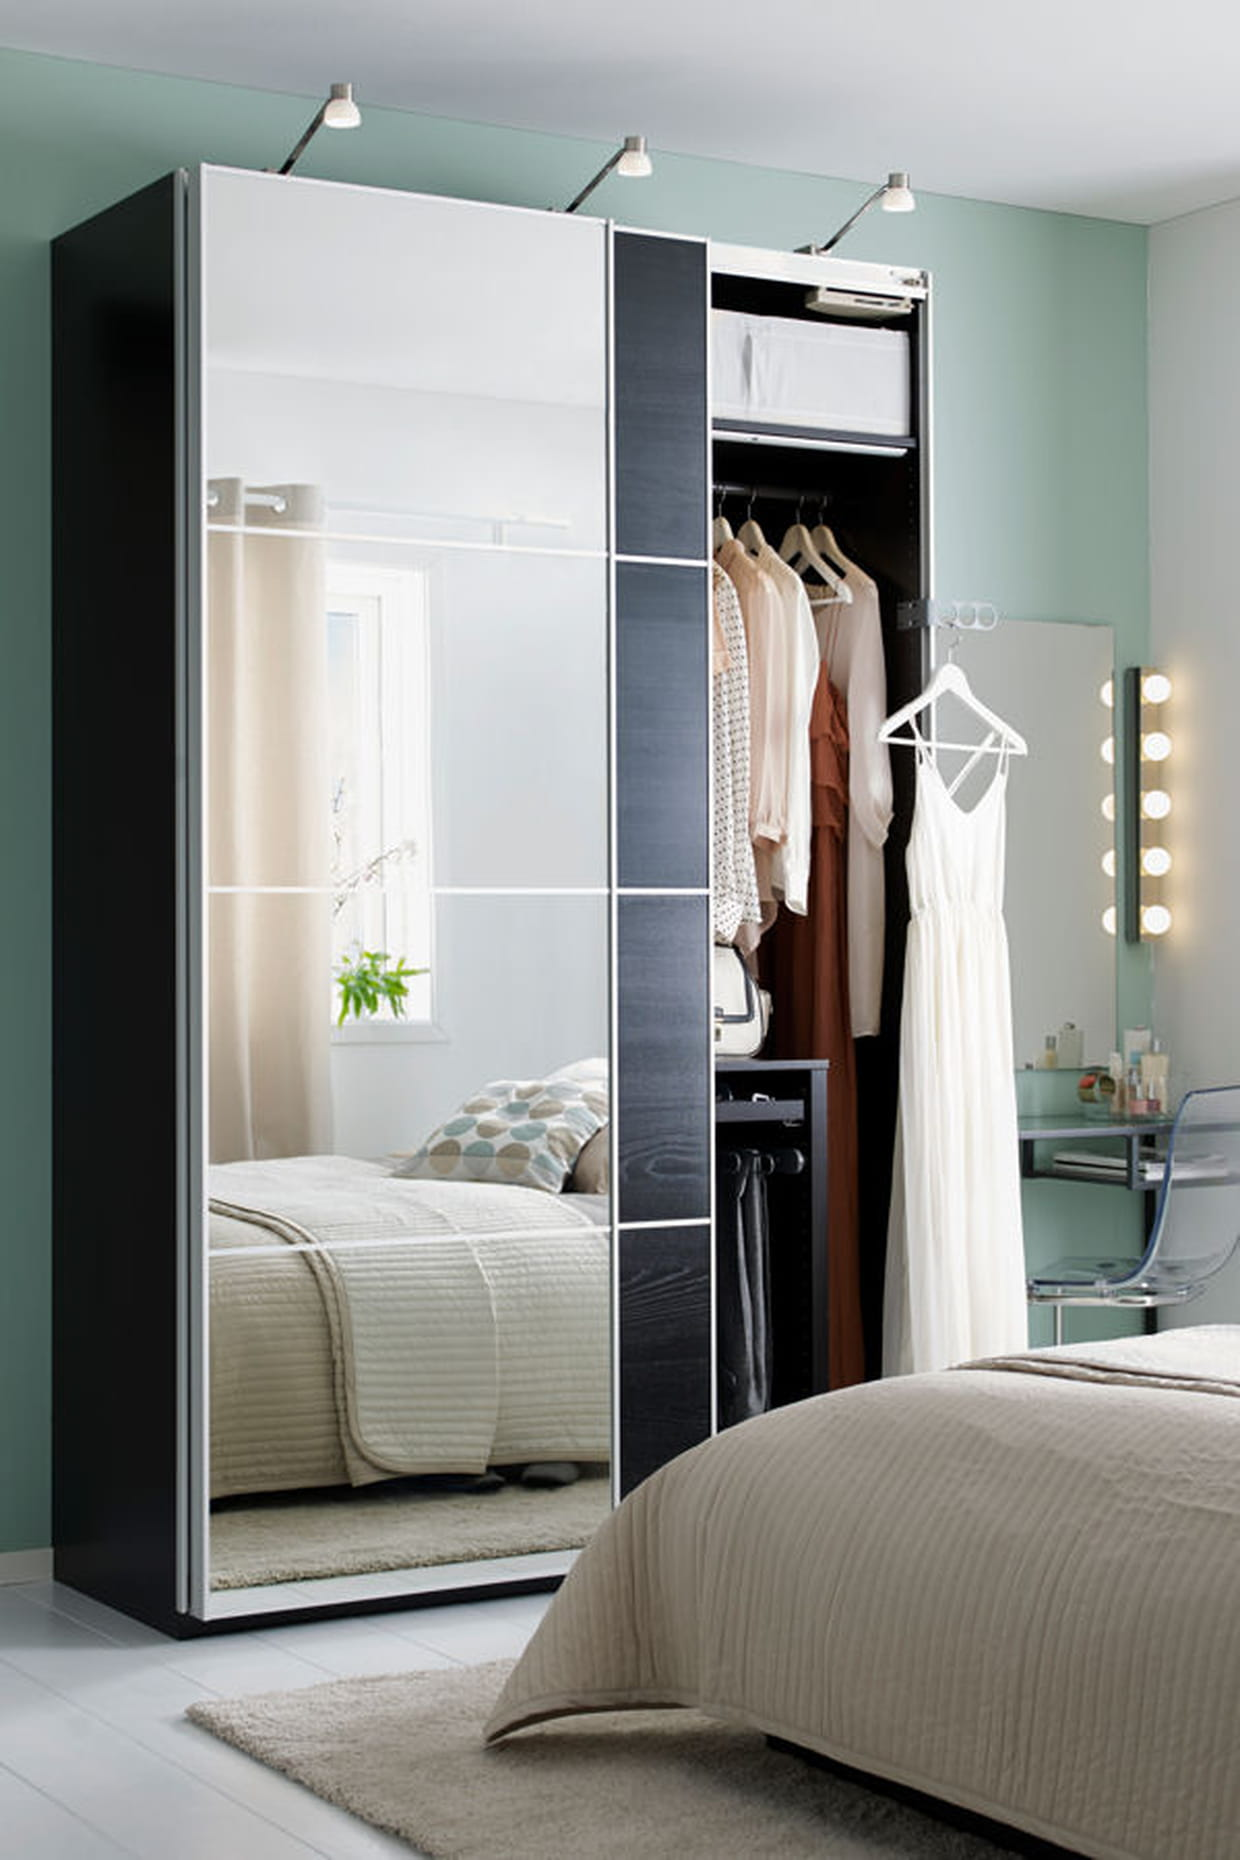 Ikea Tiroir Armoire Pax une grande armoire avec miroirs